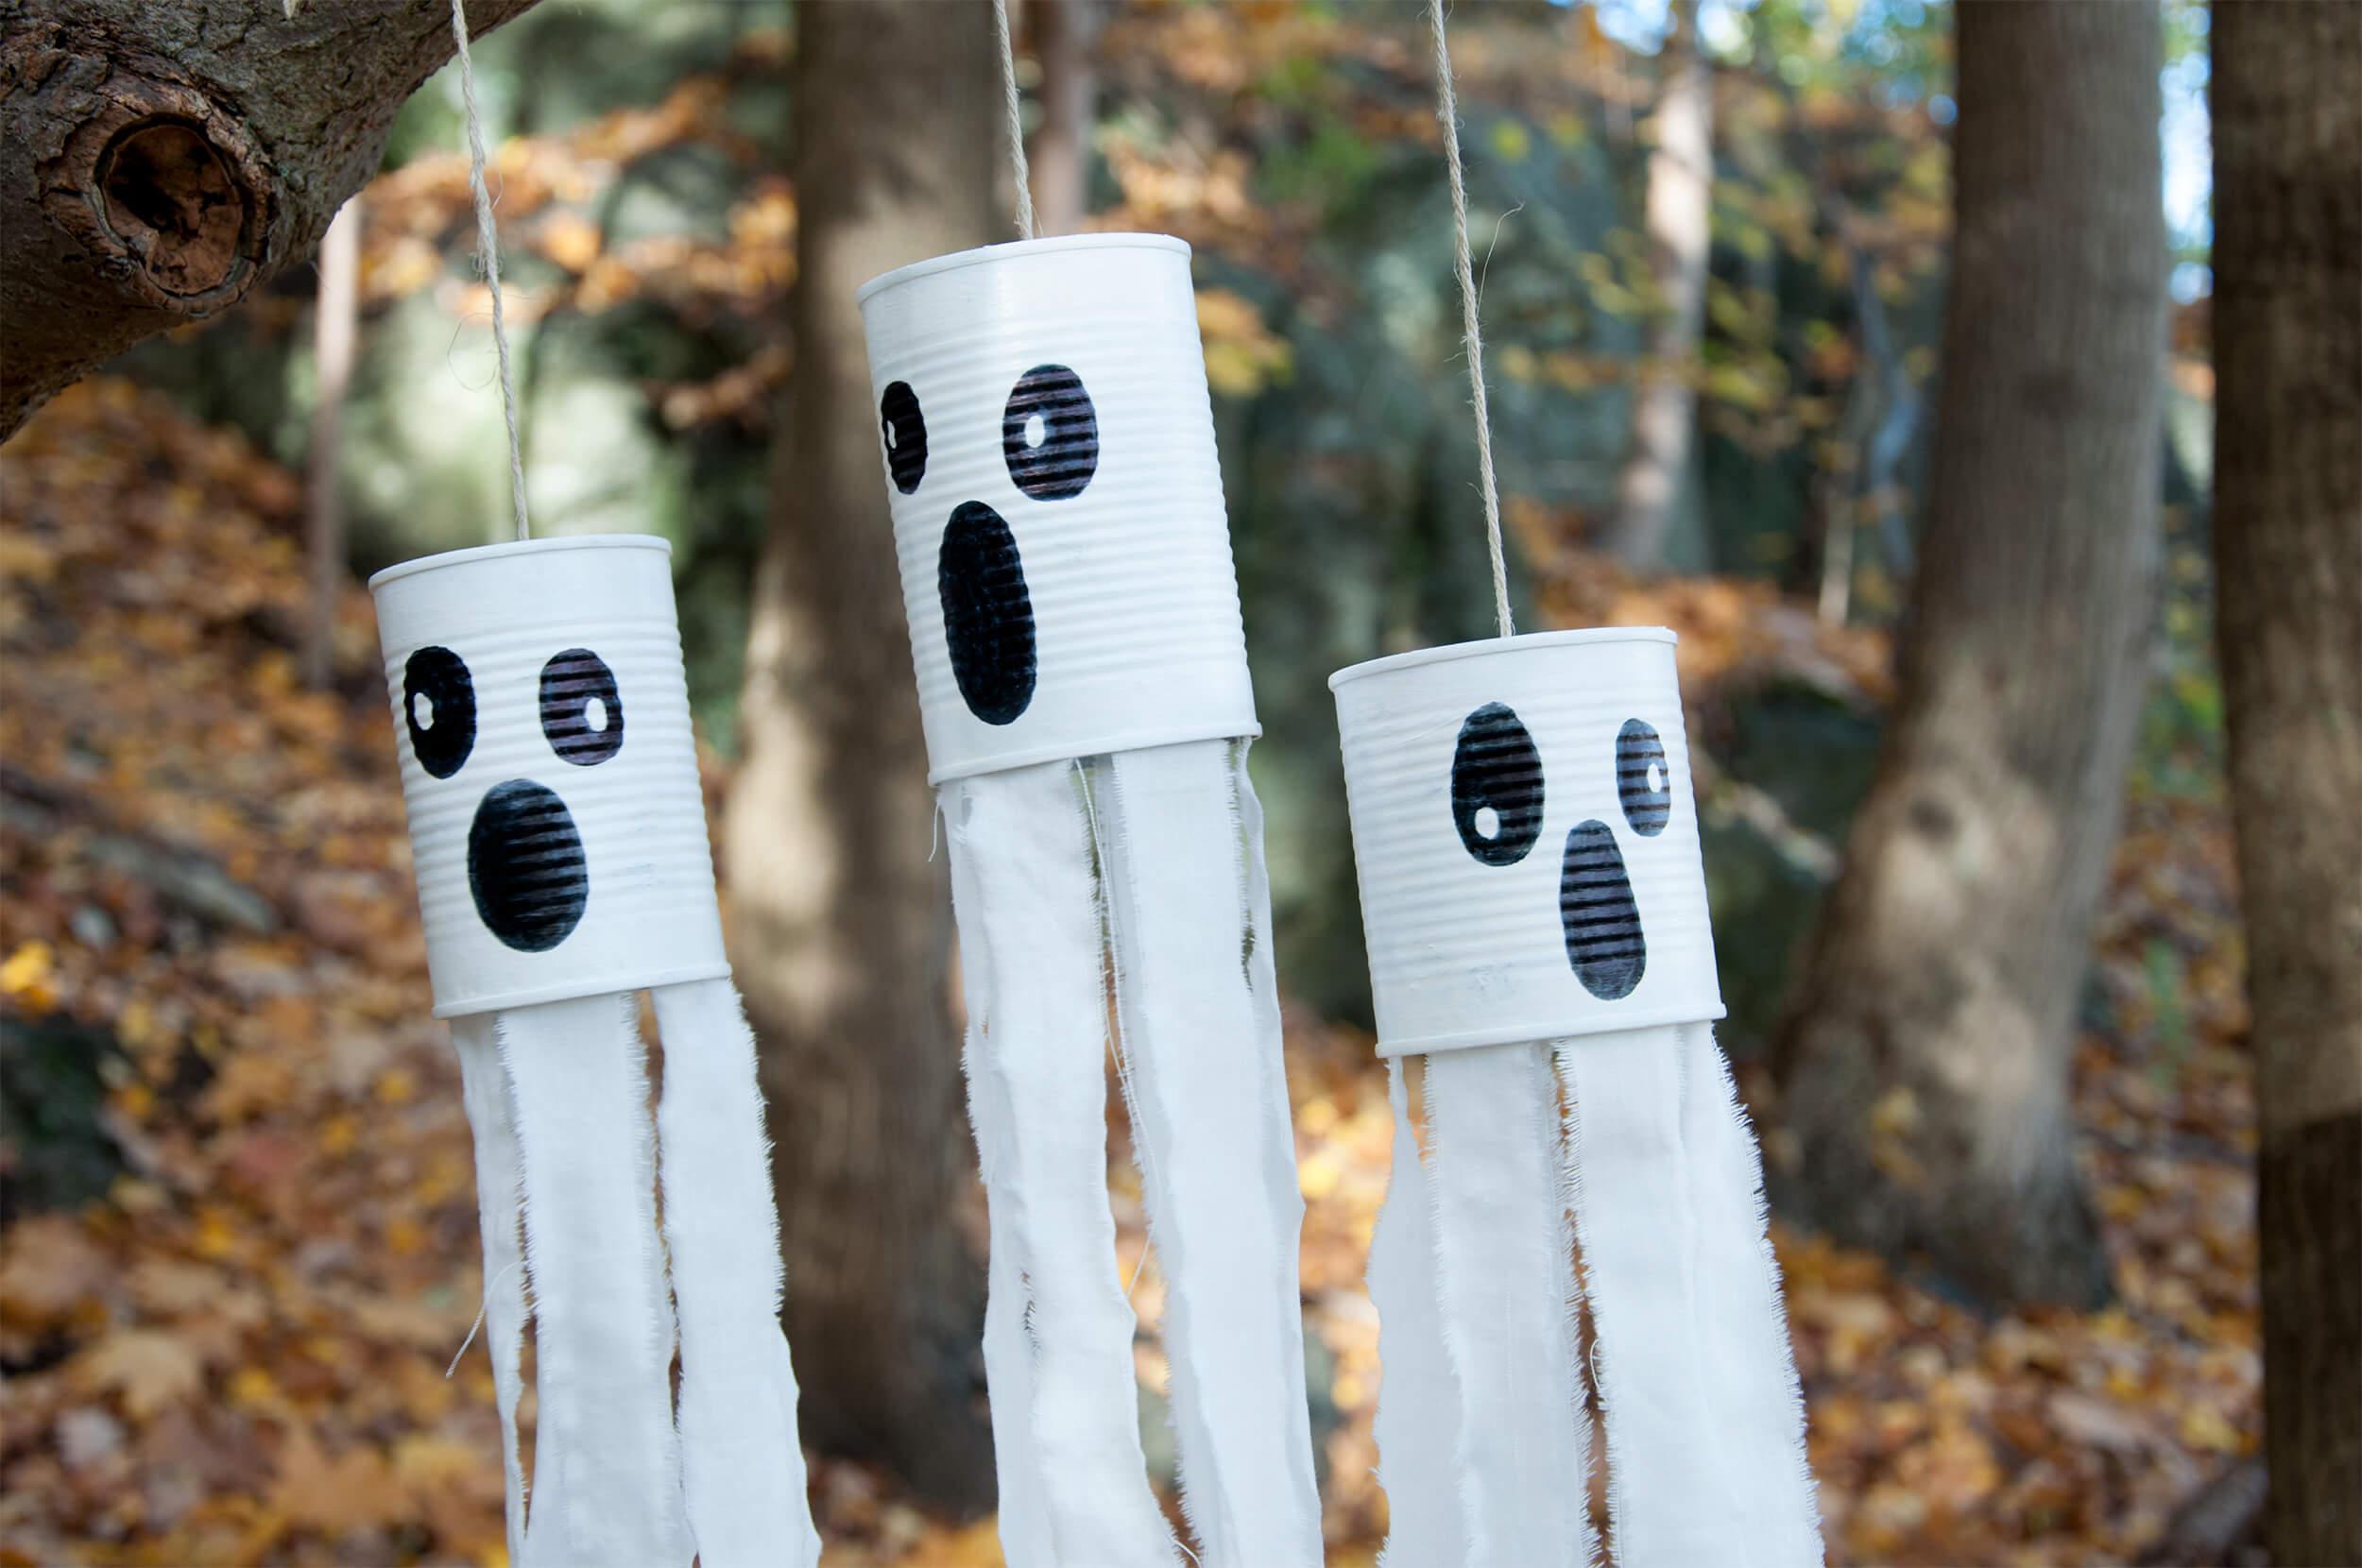 DIY – Bastle gruselige Gespenster aus Konservendosen